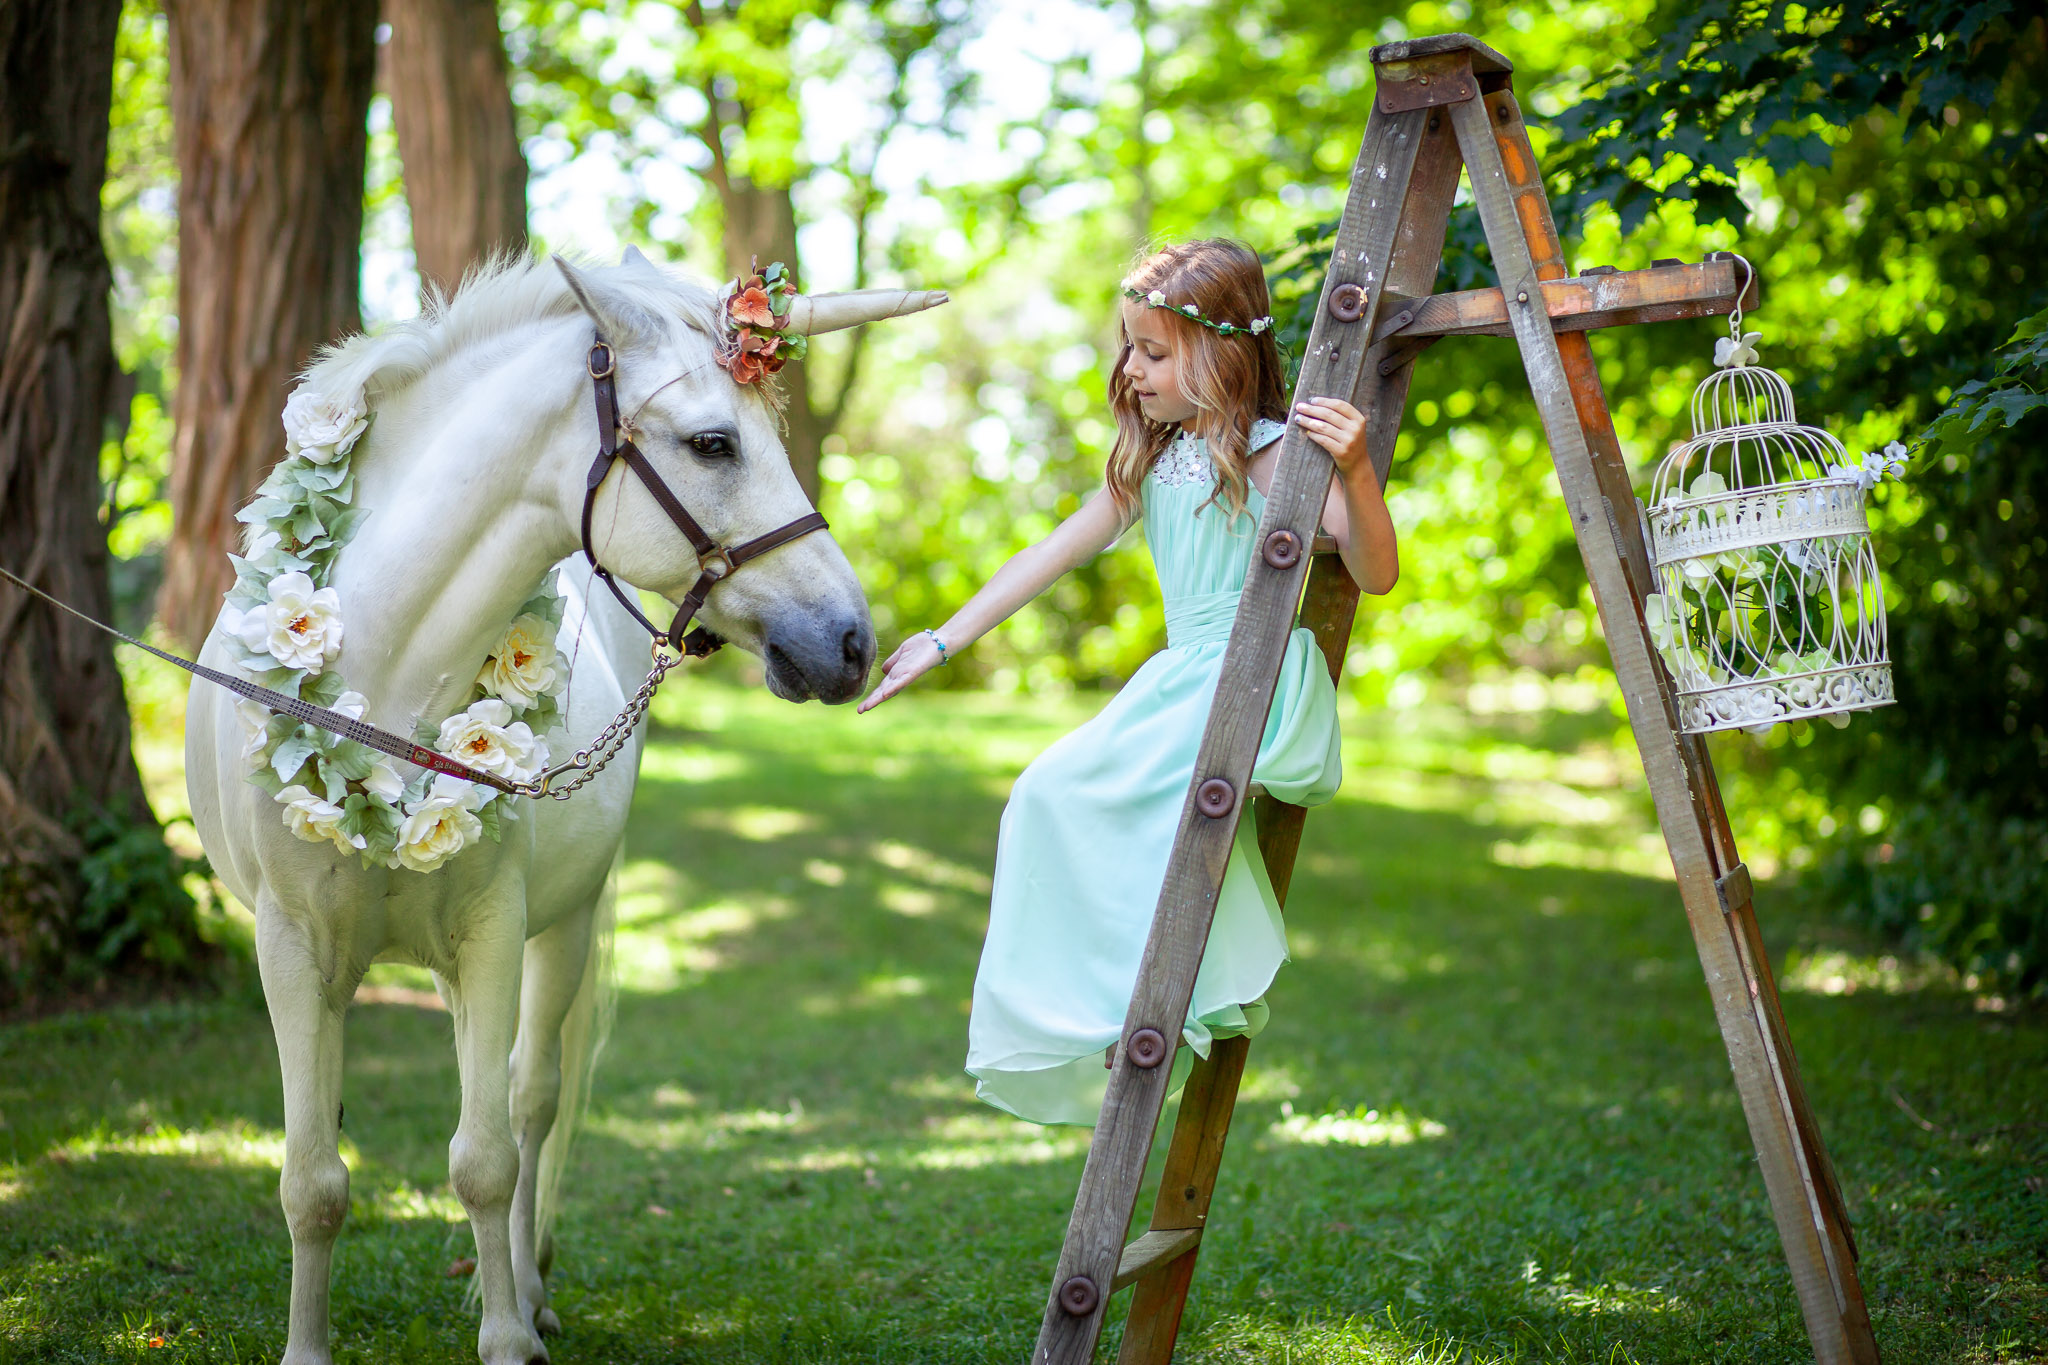 Amy D Photography- Family Photography- Unicorn Mini Sessions- Unicorn Photo Session- Childrens Mini Session - Little Girl Photo Session- Whimisical-22.jpg